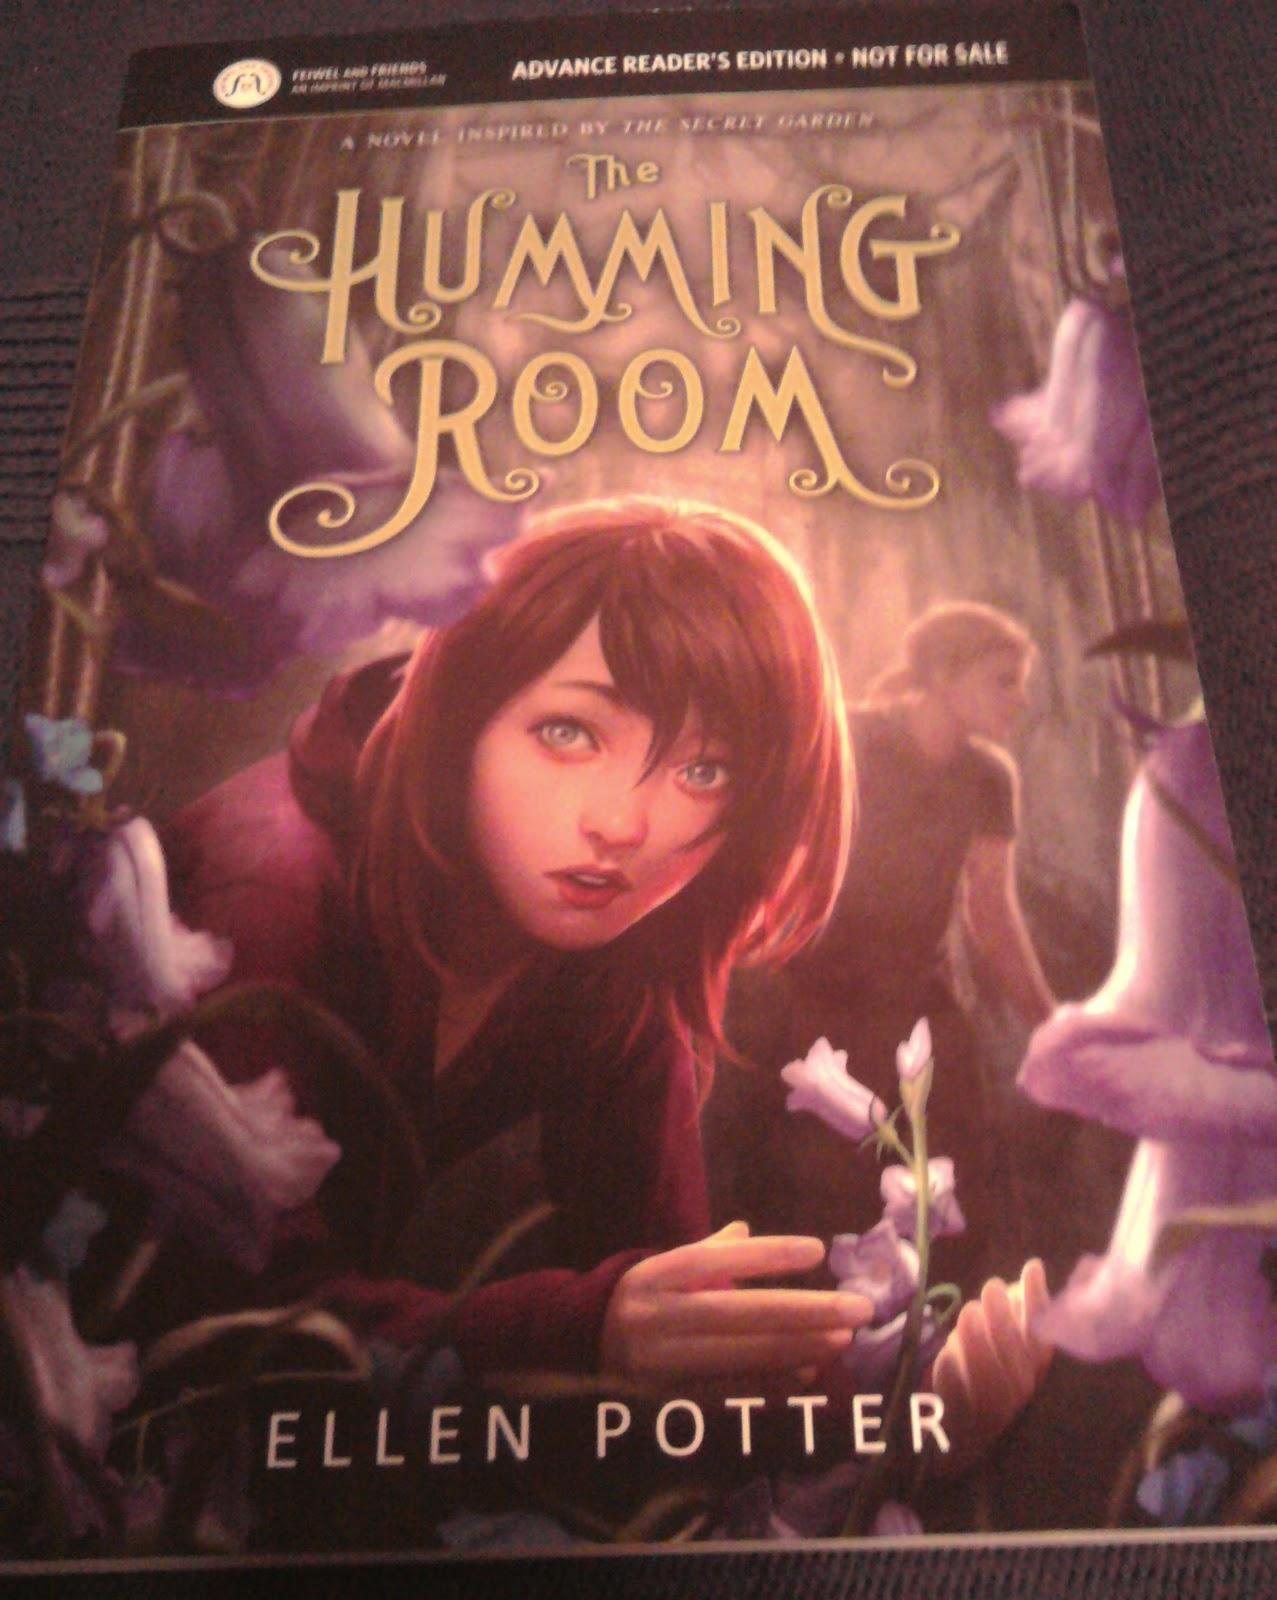 The Humming Room By Ellen Potter (arc)